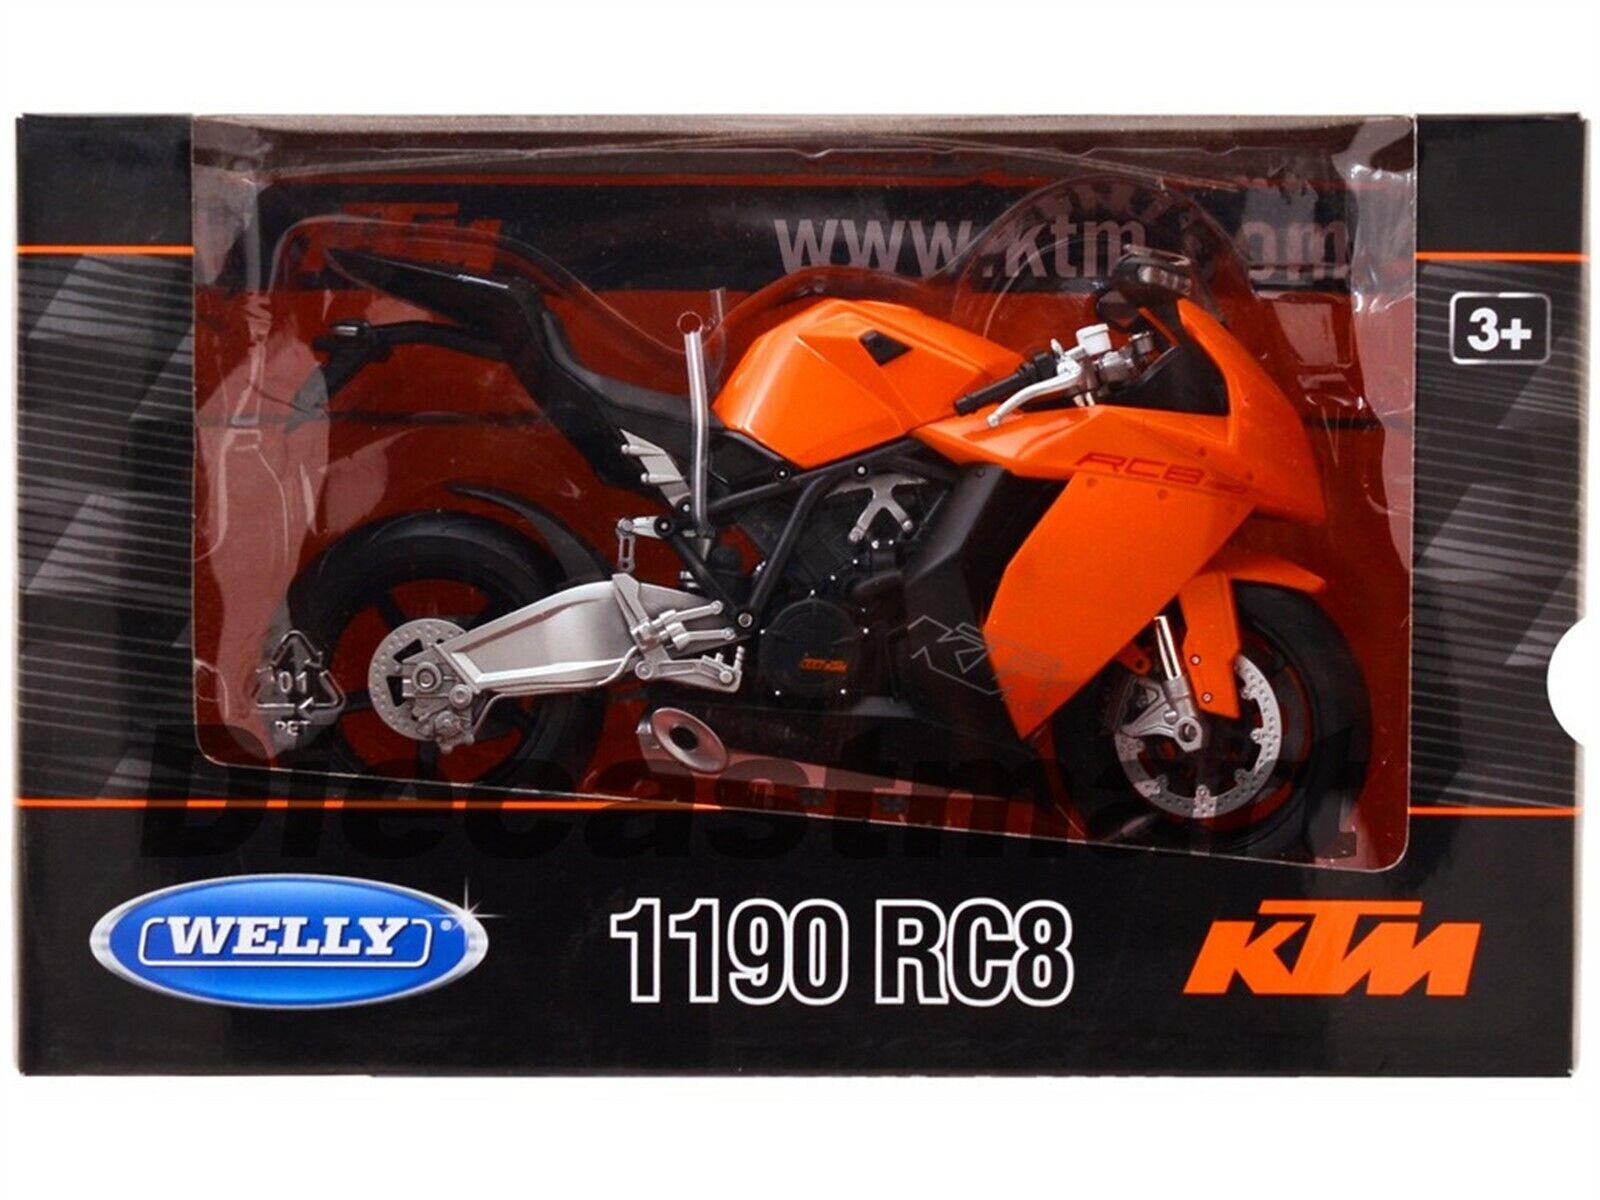 Kawasaki zx-14 negro 2011 moto modelo 1:12 la cast bike Model